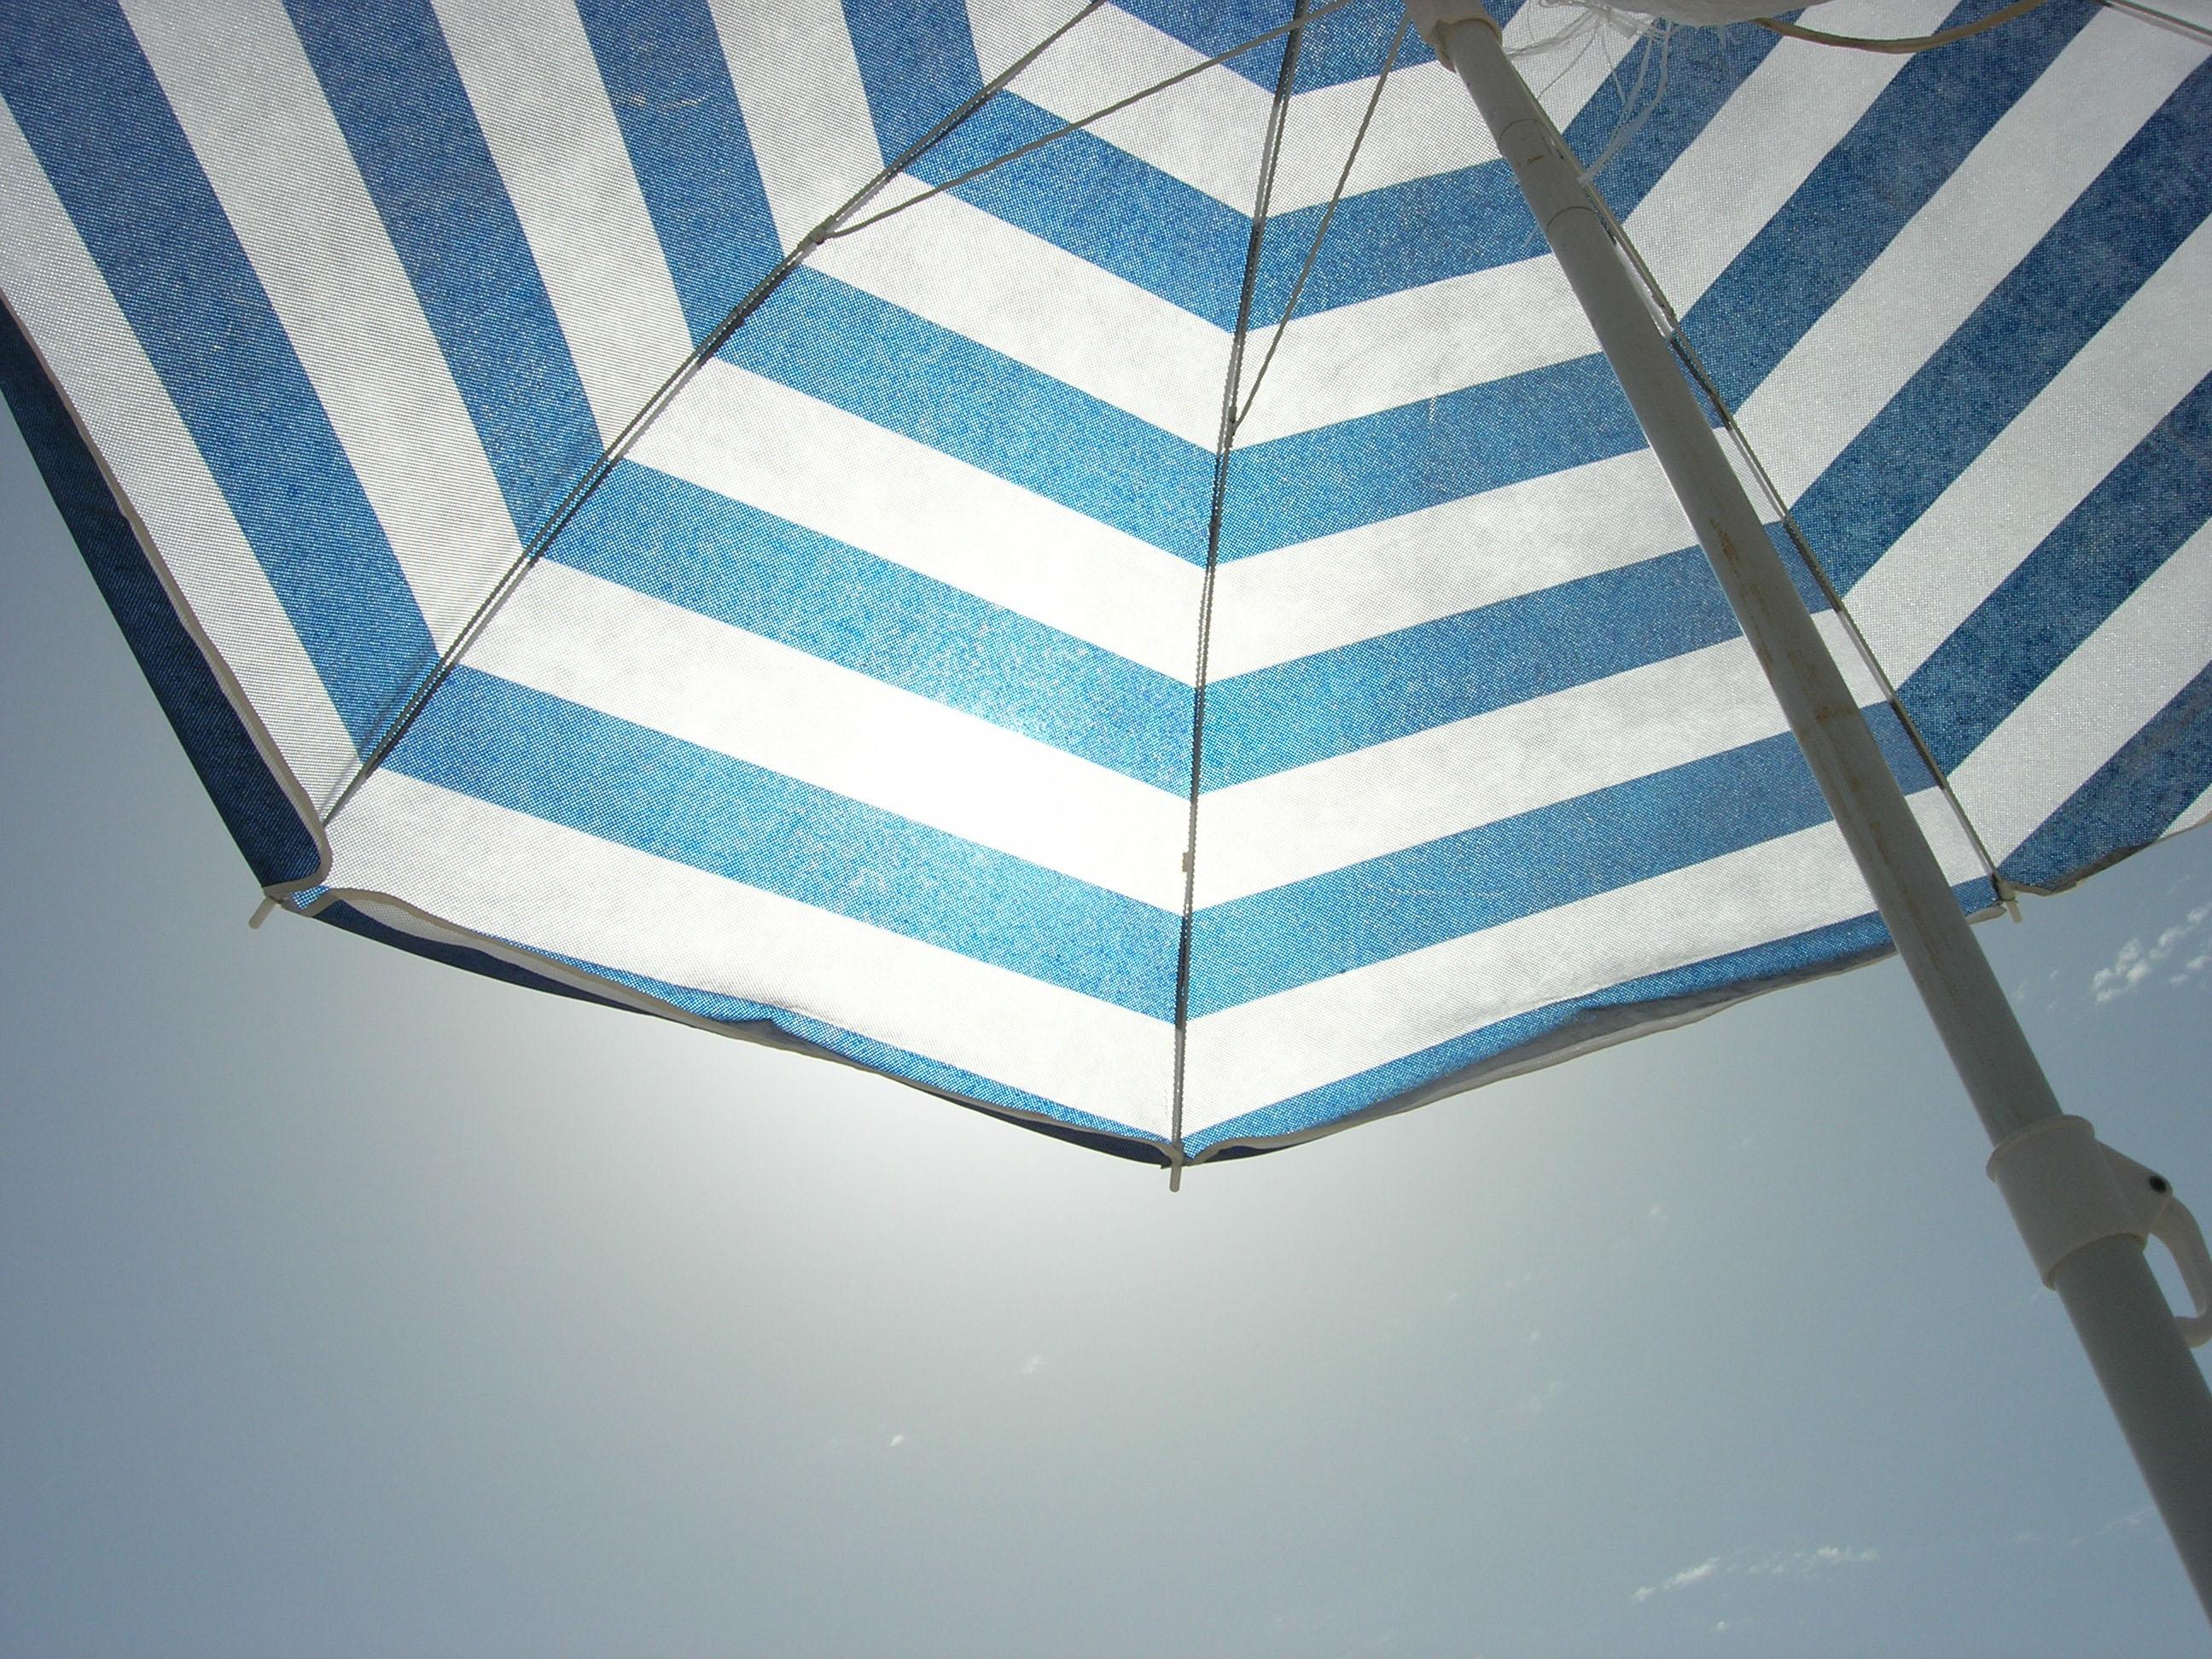 umbrella insurance, umbrella policy, umbrella-insurance-muskegon-michigan